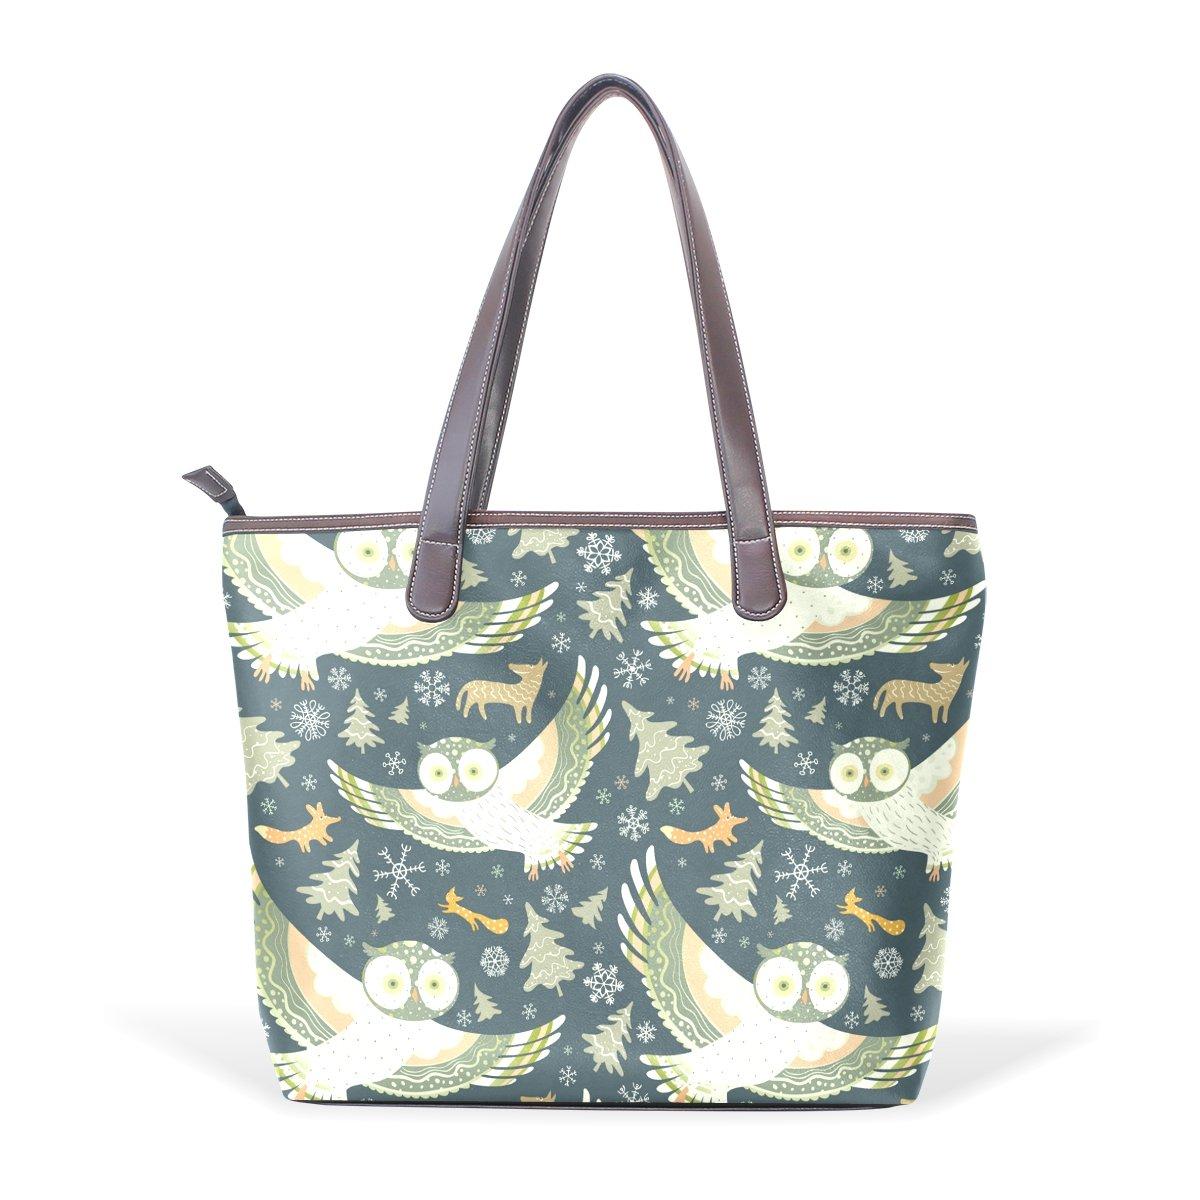 Owl Pattern Print Womens Fashion Large Tote Ladies Handbag Shoulder Bag